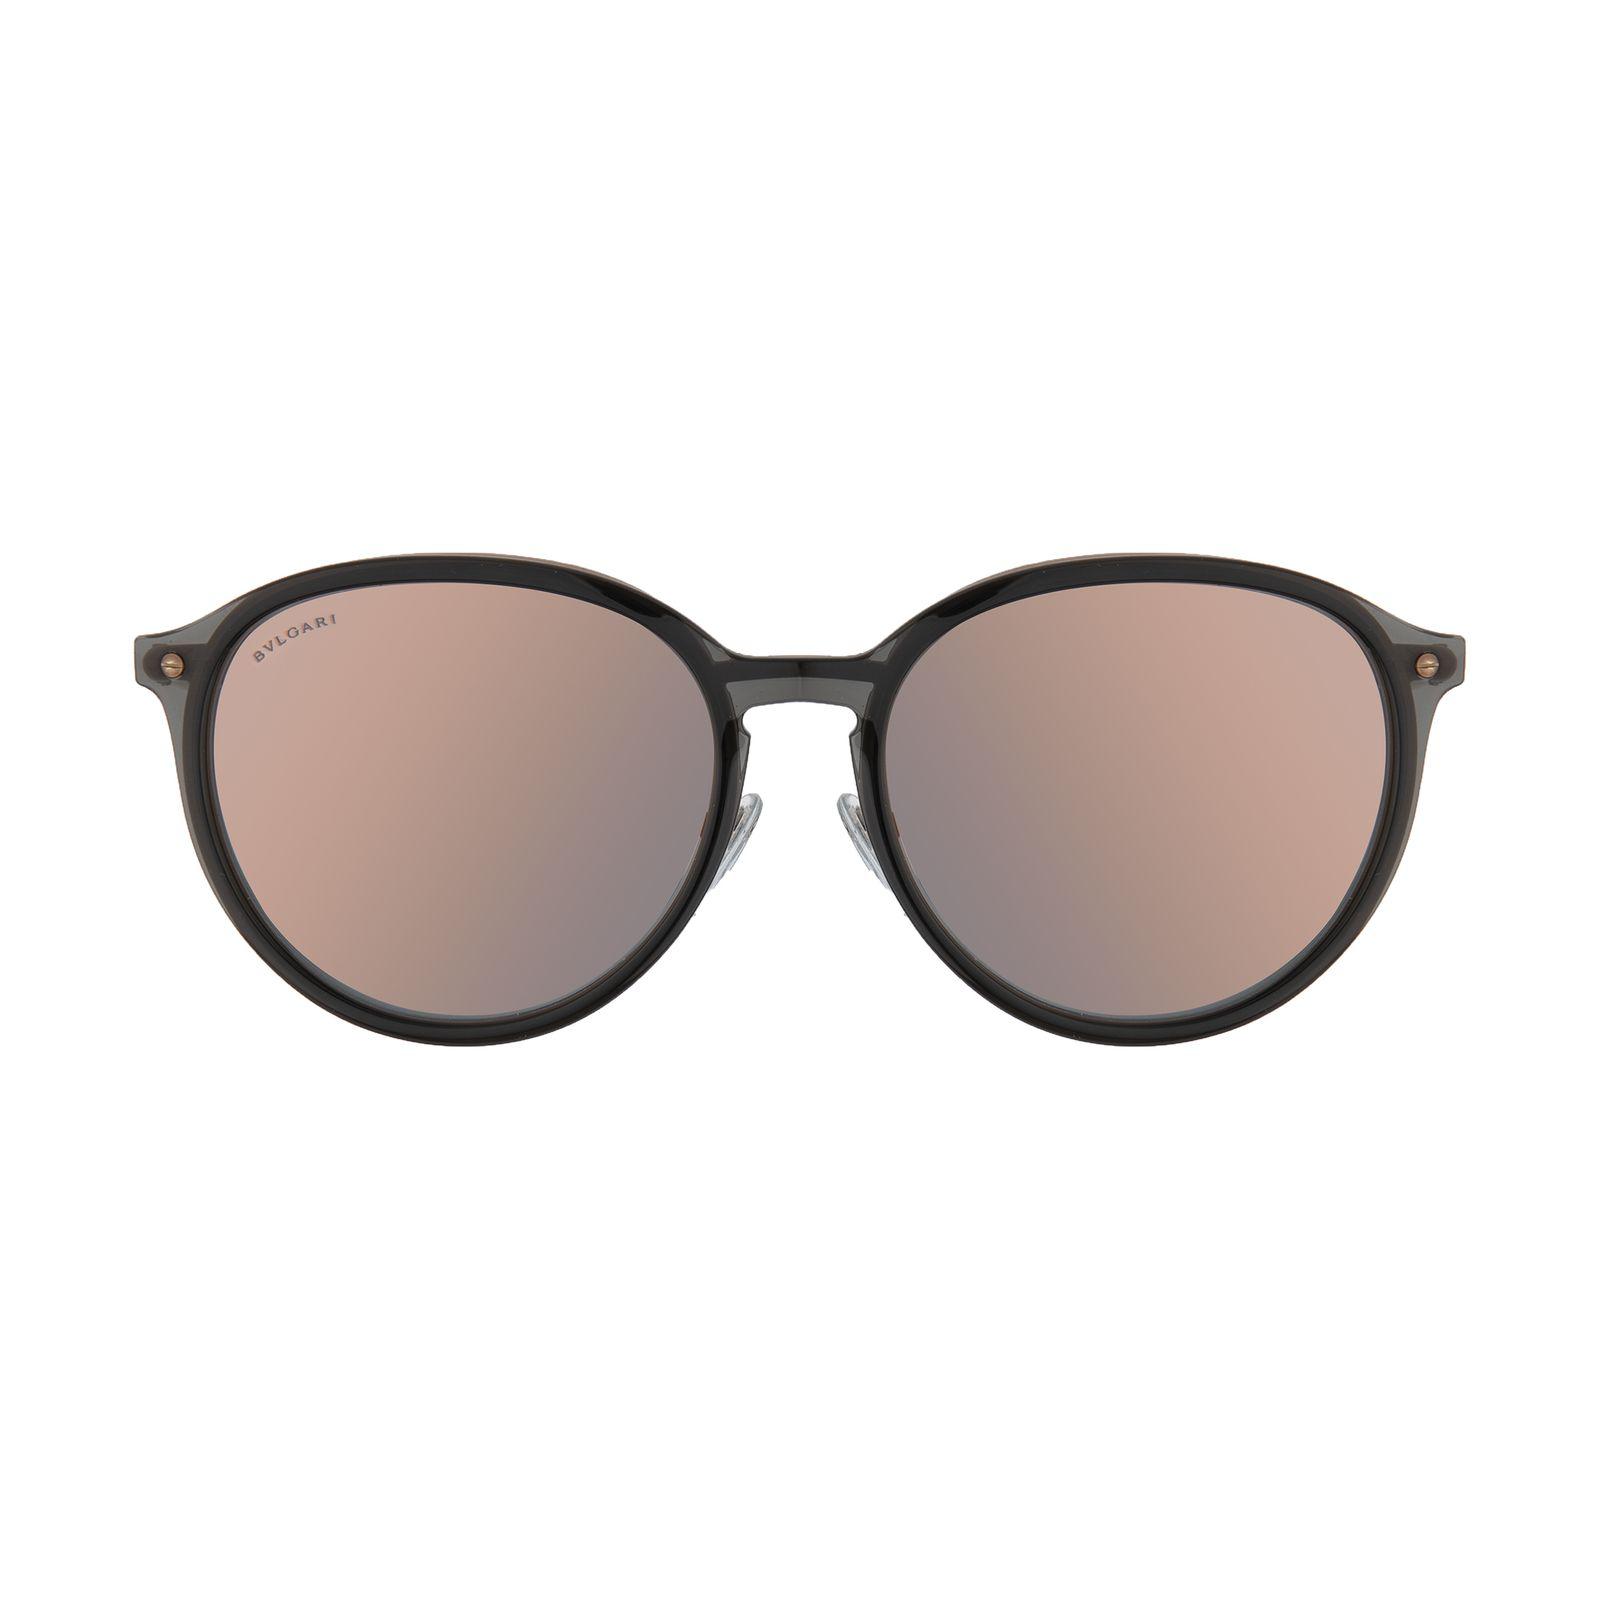 عینک آفتابی زنانه بولگاری مدل BV5045S 20134Z -  - 2